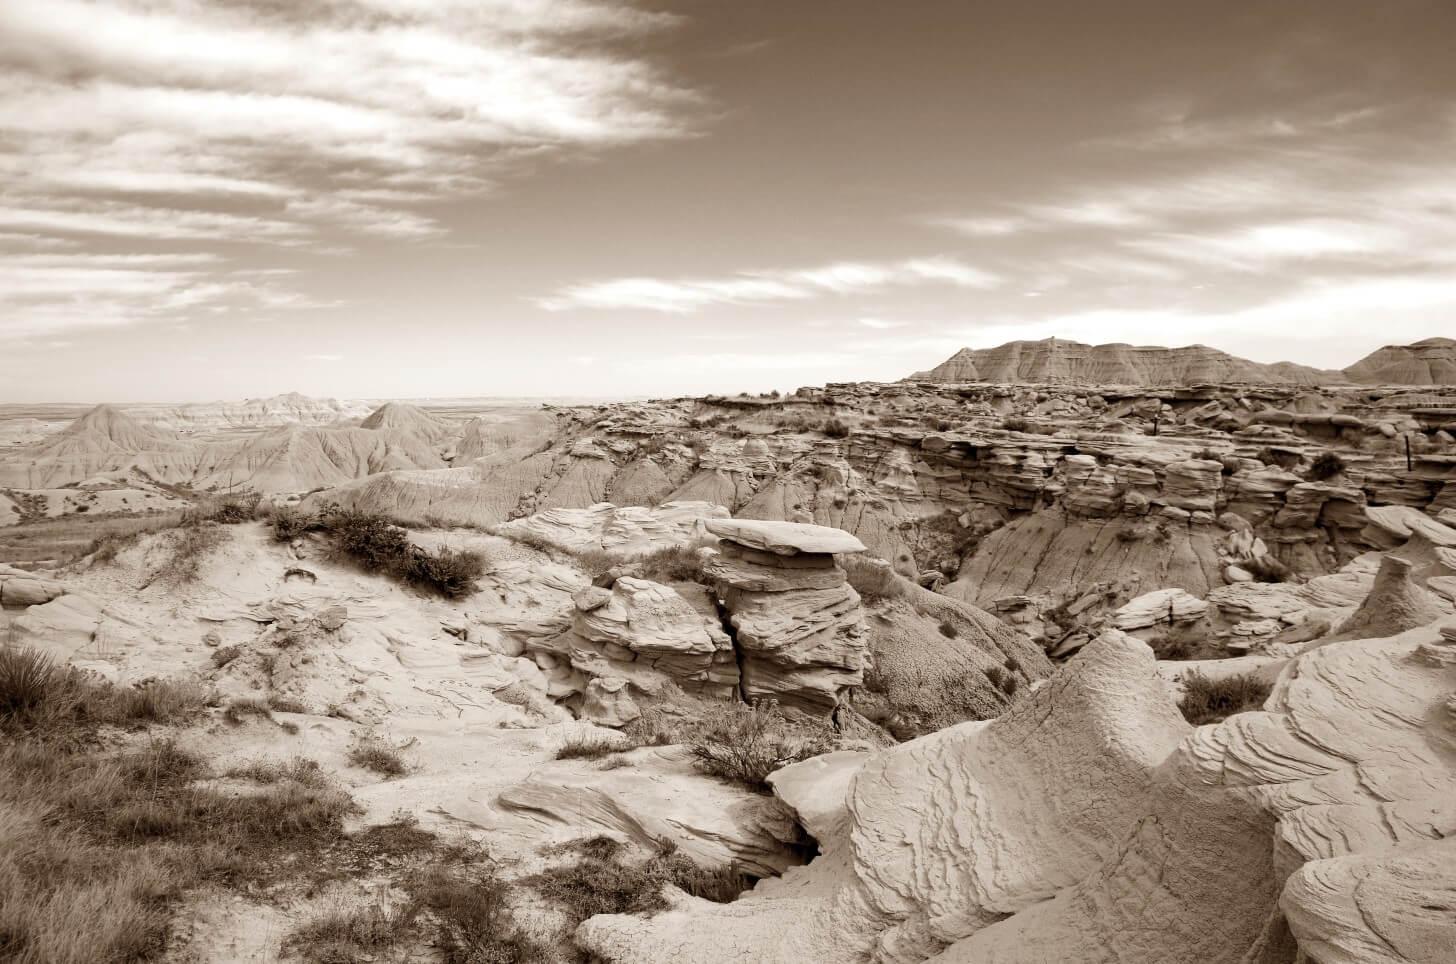 Toadstool Geologic Park, Nebraska, Faces Interview Paul Magnanti